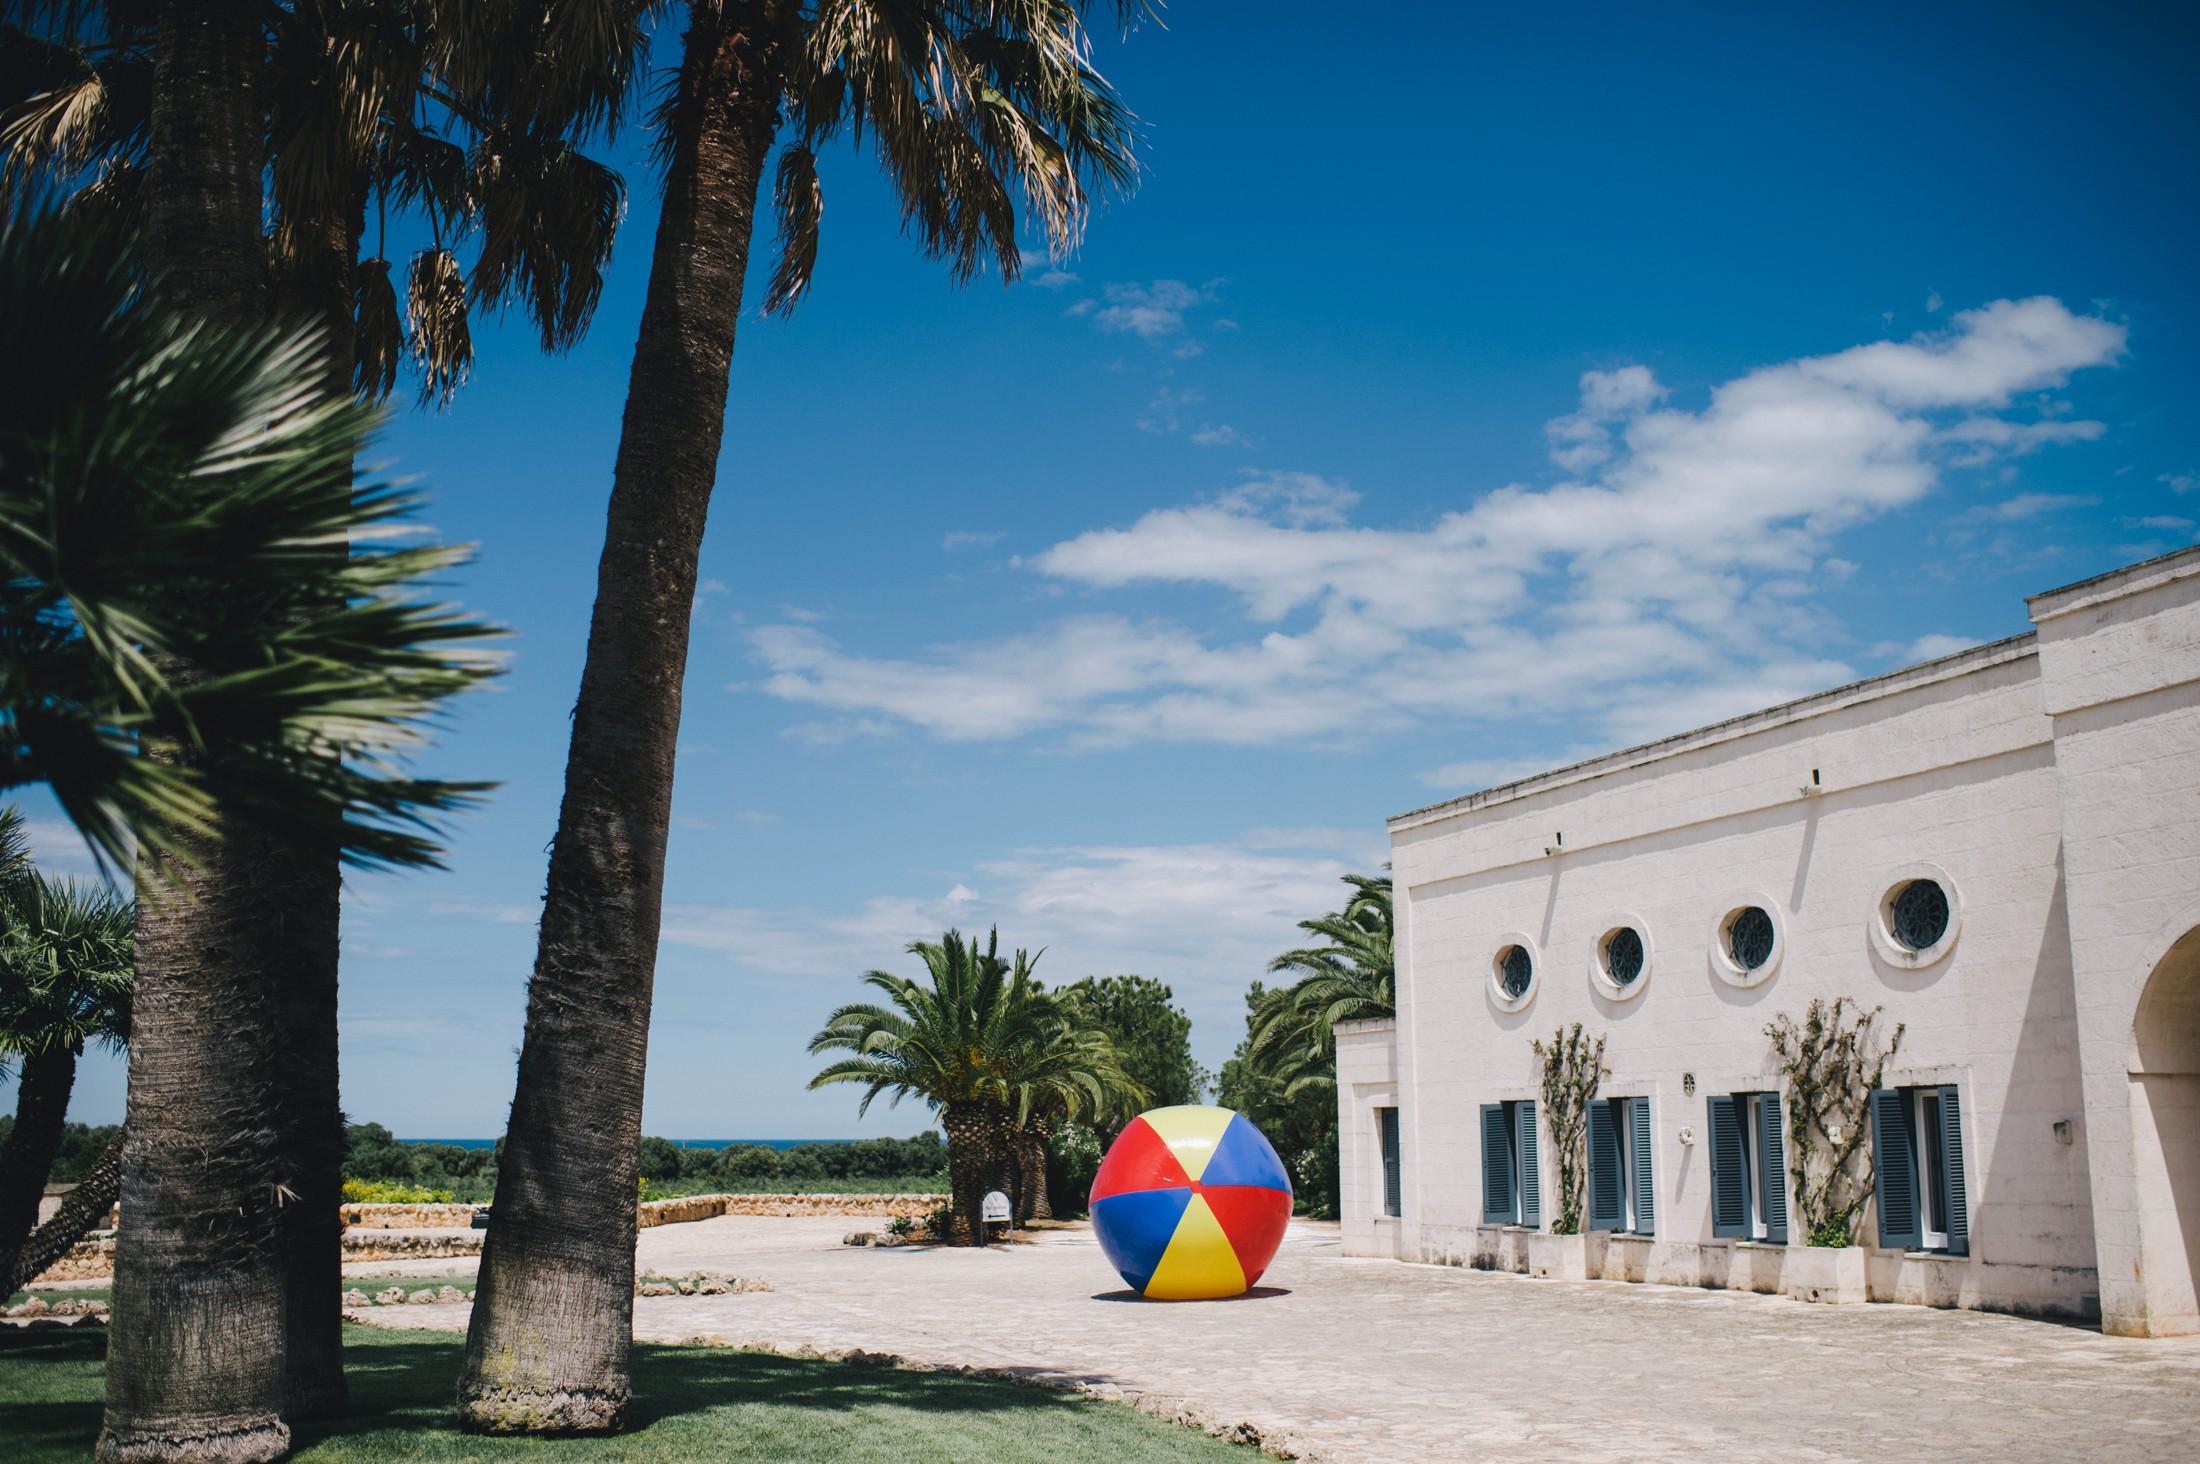 gian ballon at masseria san domenico